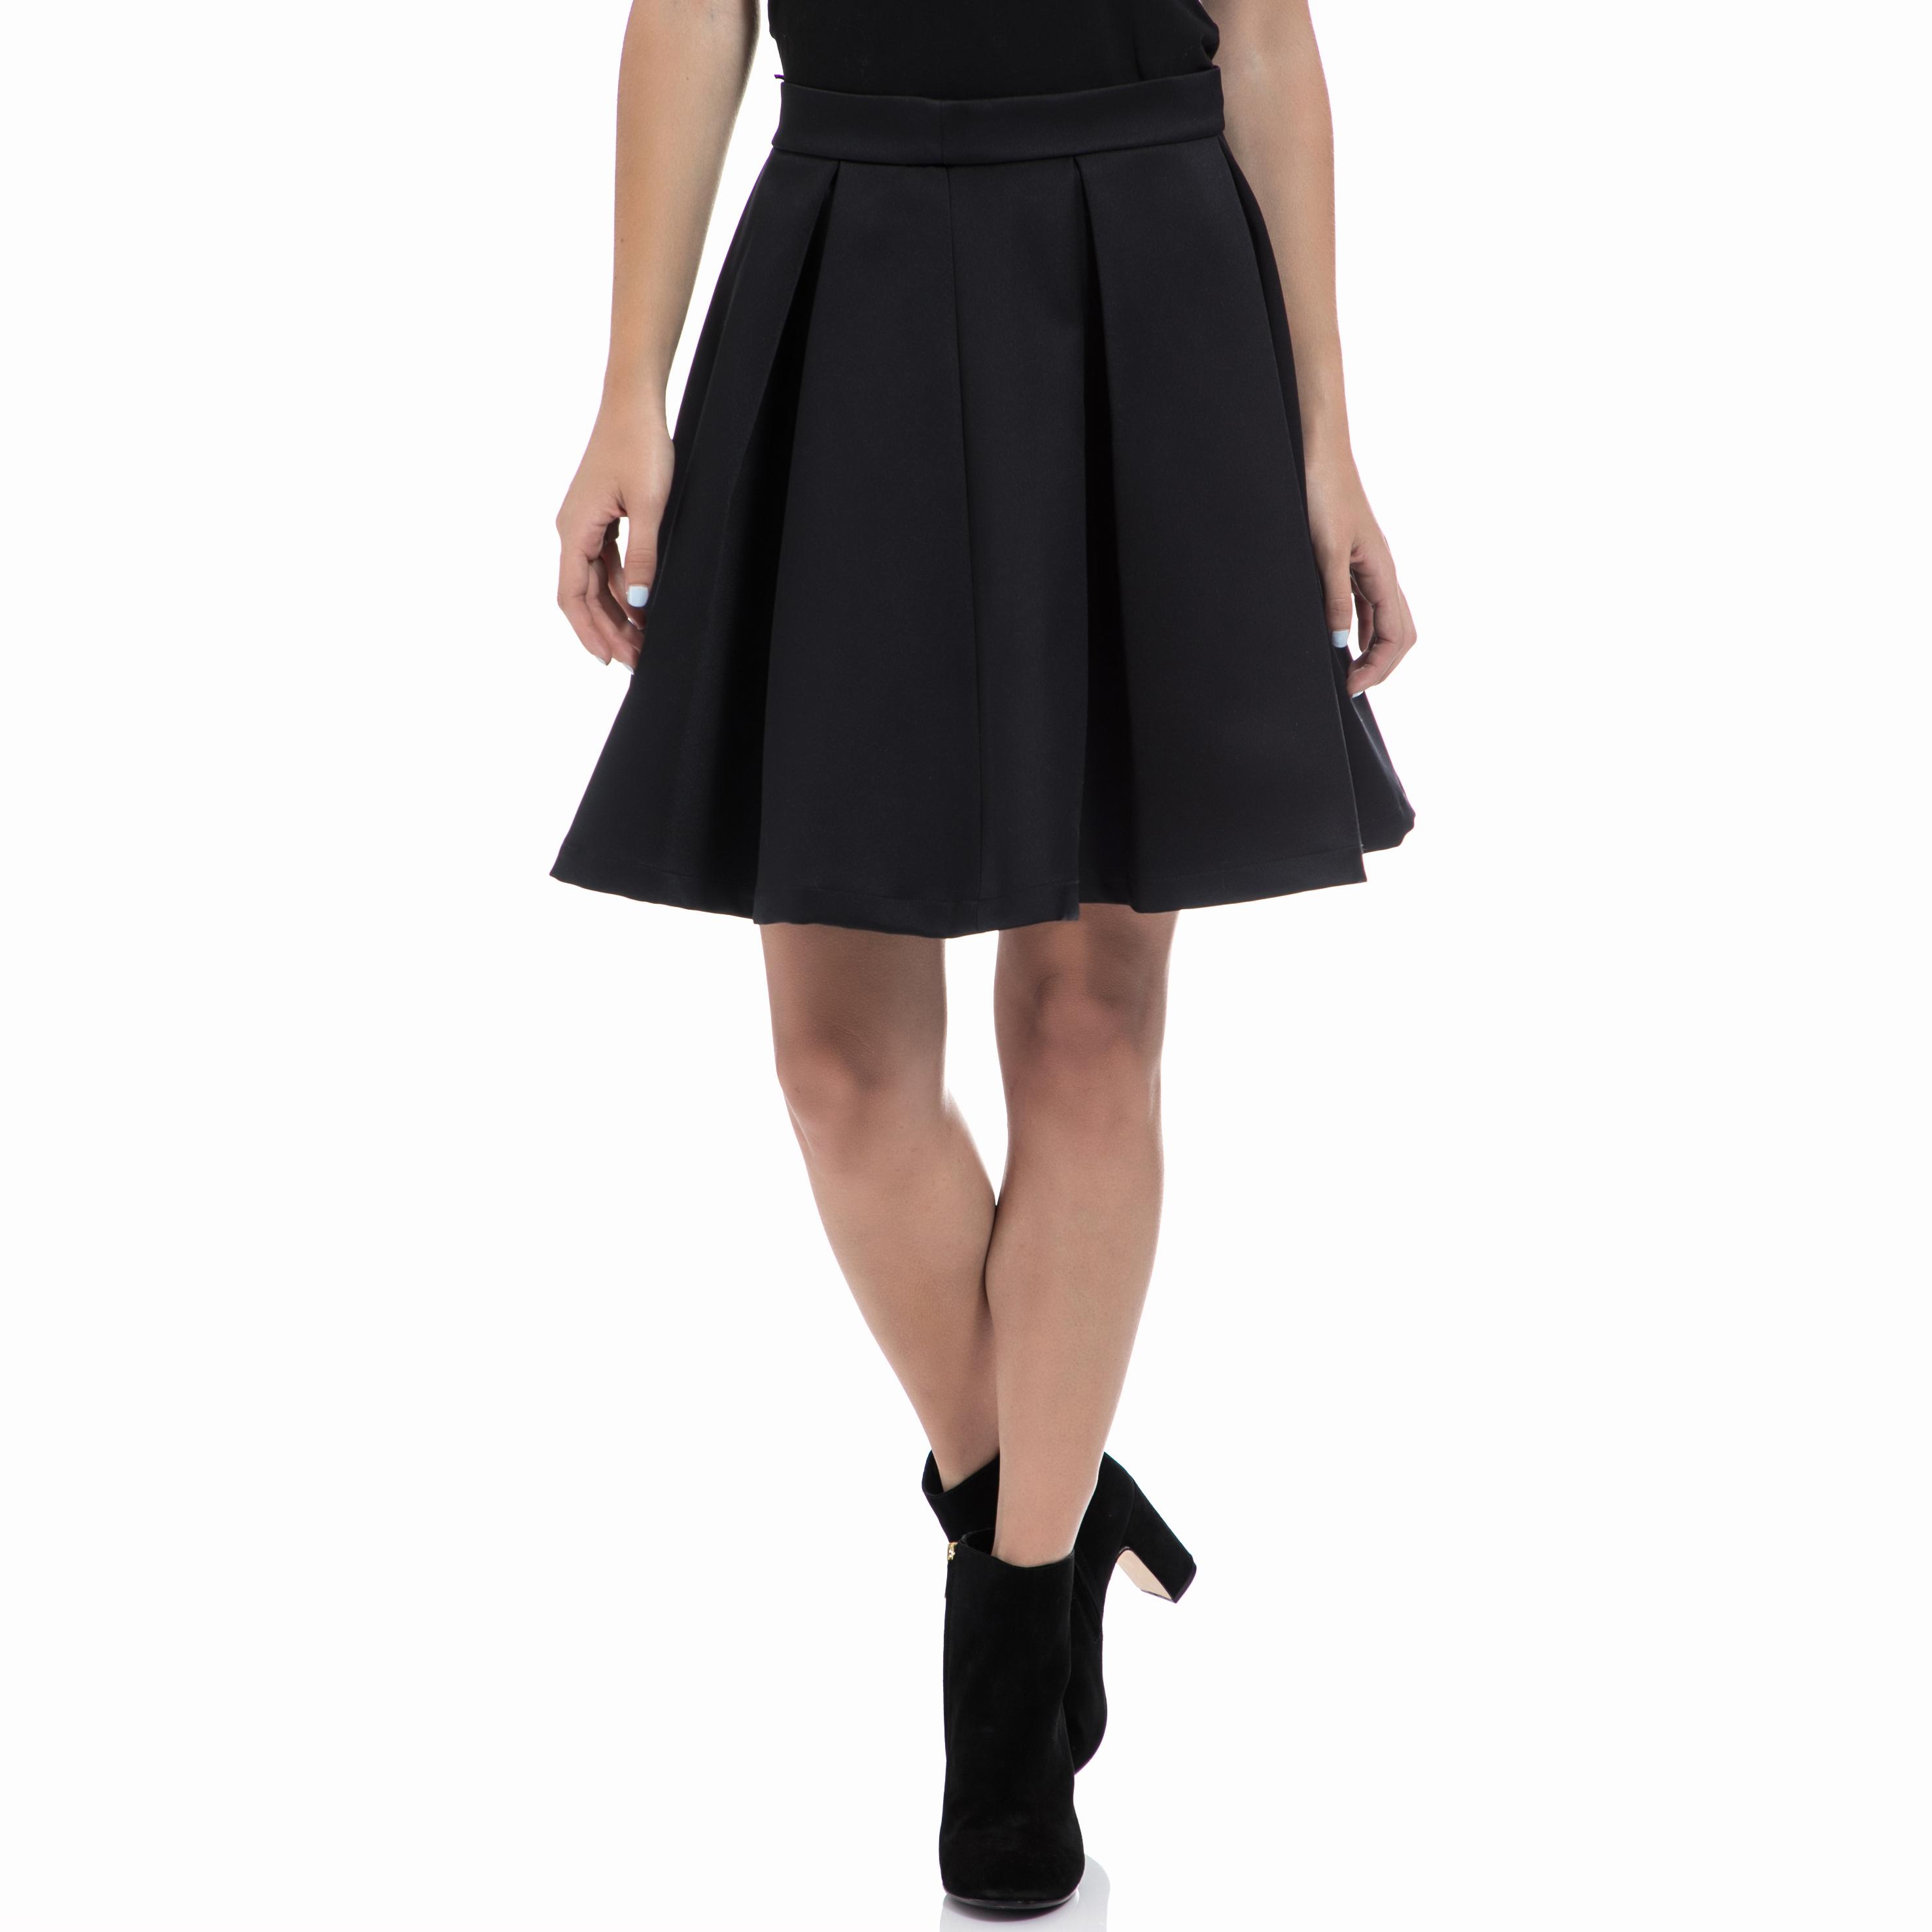 GUESS - Γυναικεία φούστα GUESS μαύρη γυναικεία ρούχα φούστες μέχρι το γόνατο